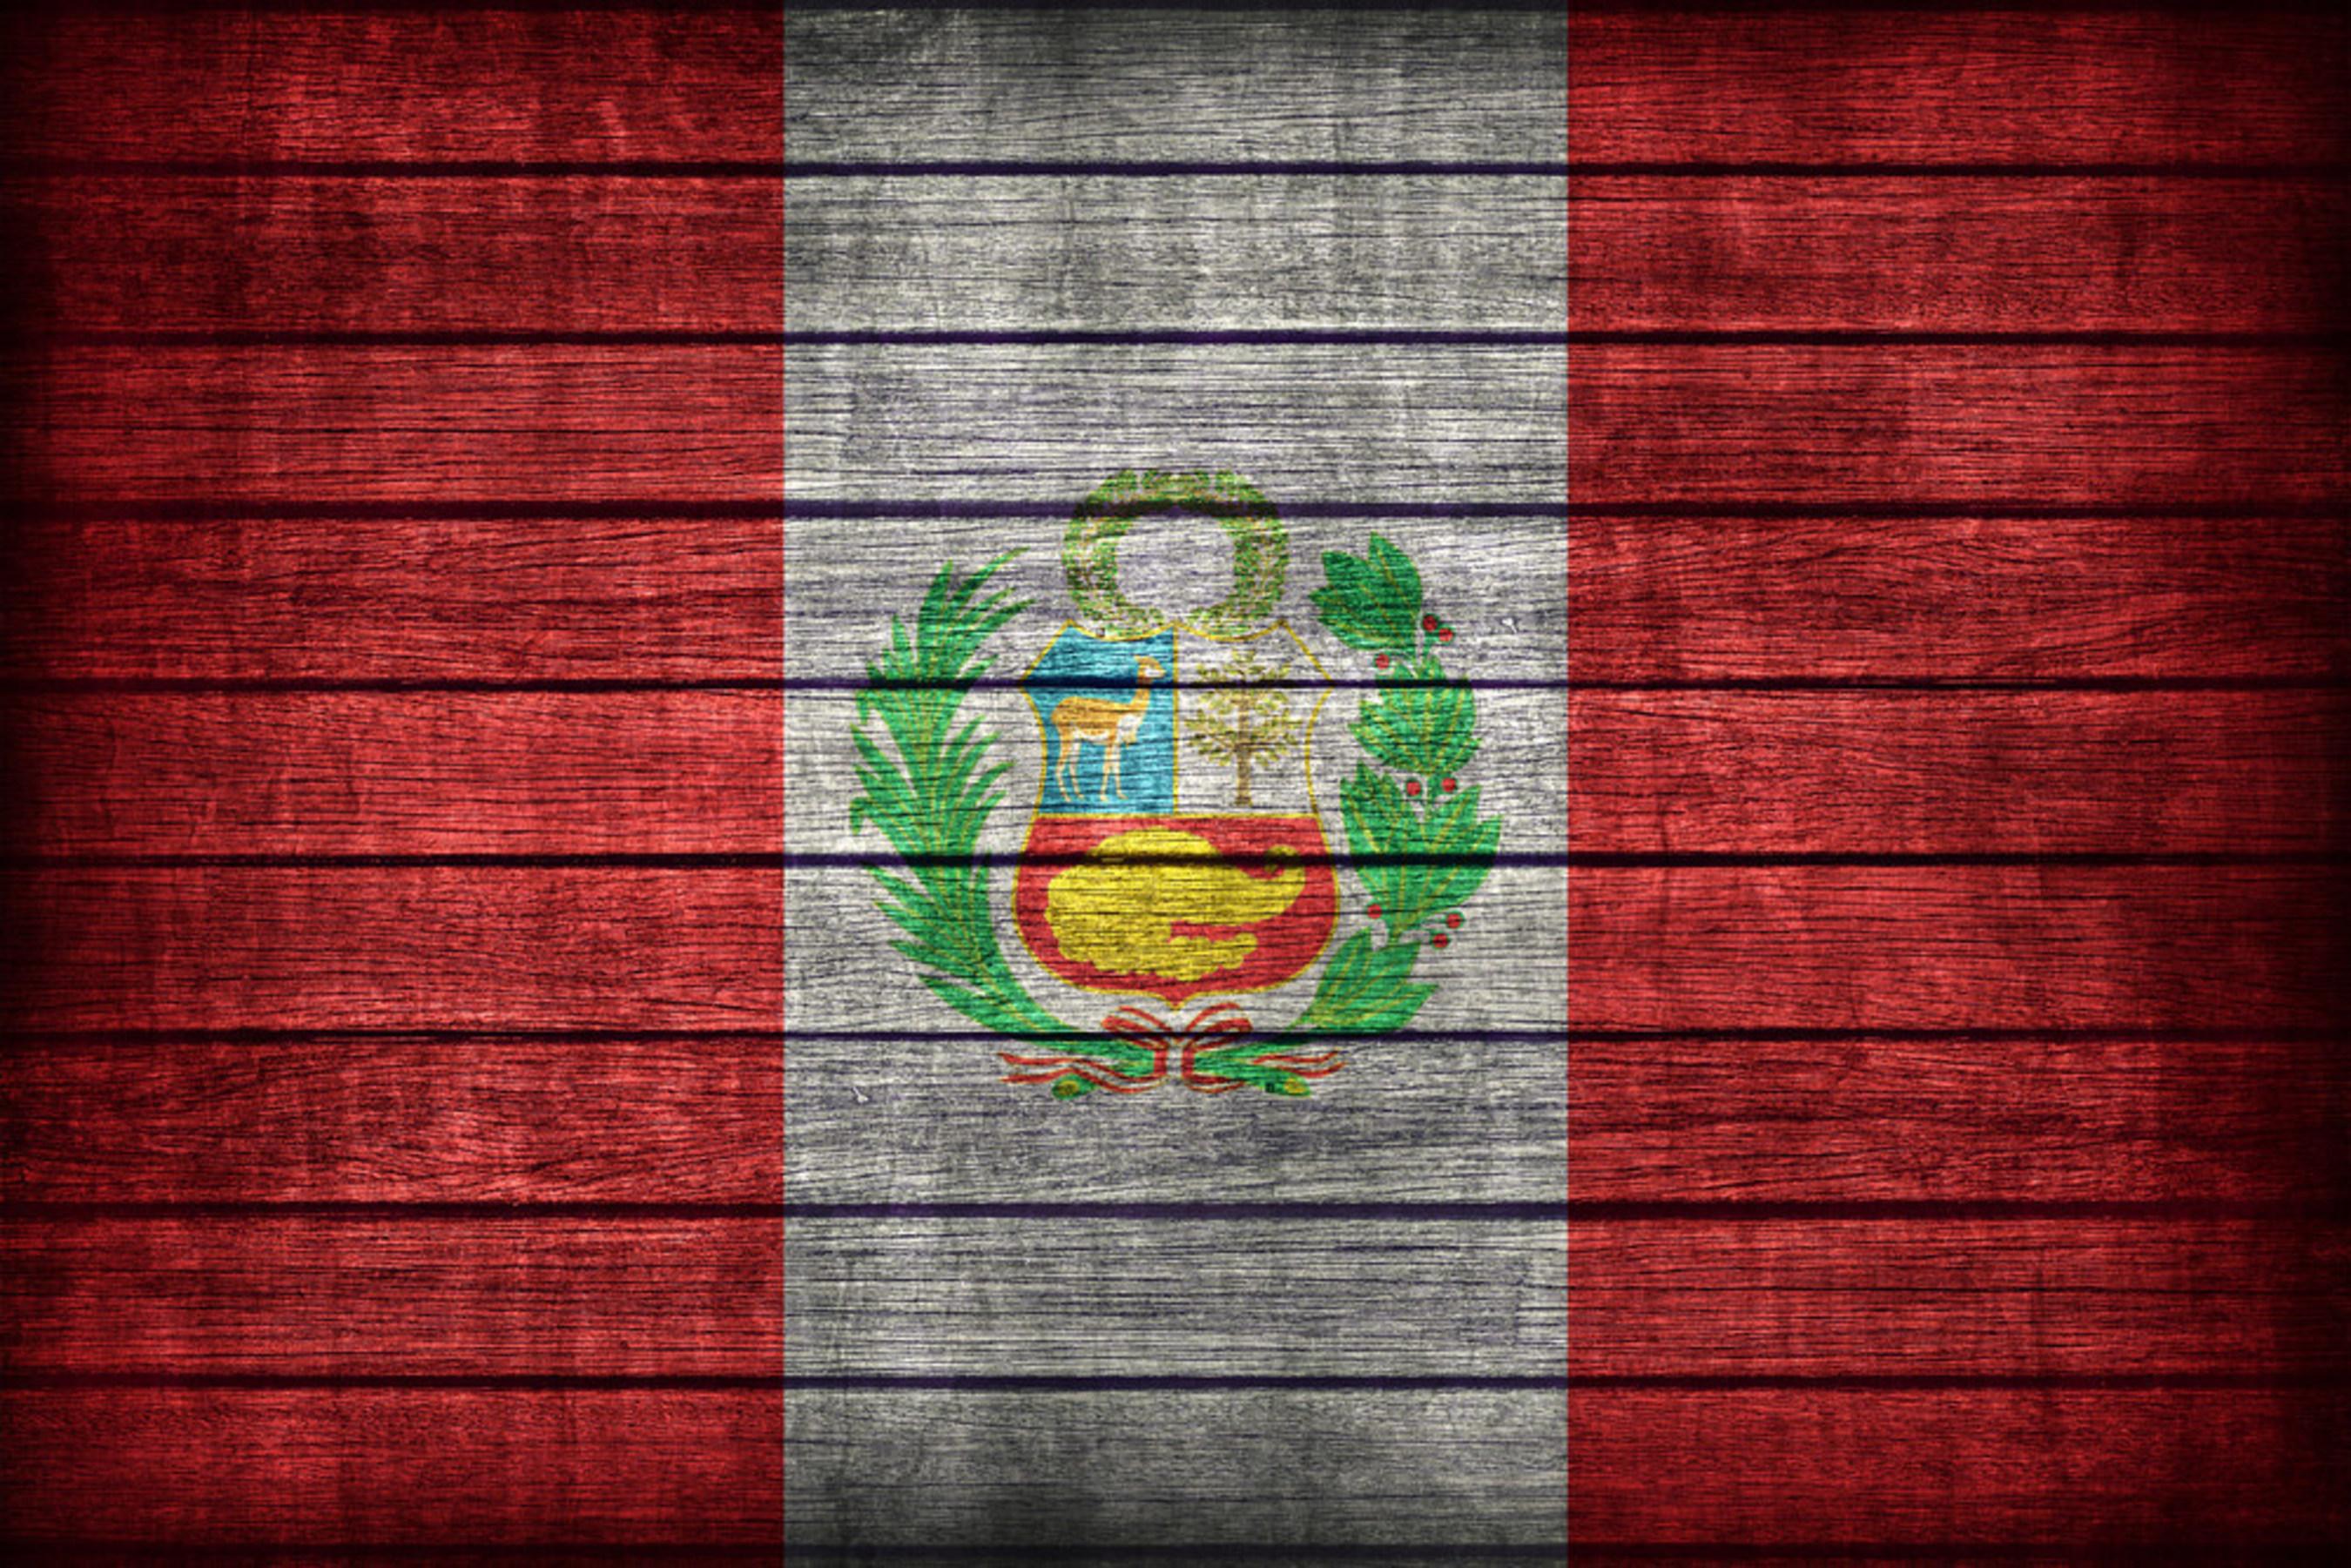 Sharemoney Introduces International Money Transfer Services To Peru